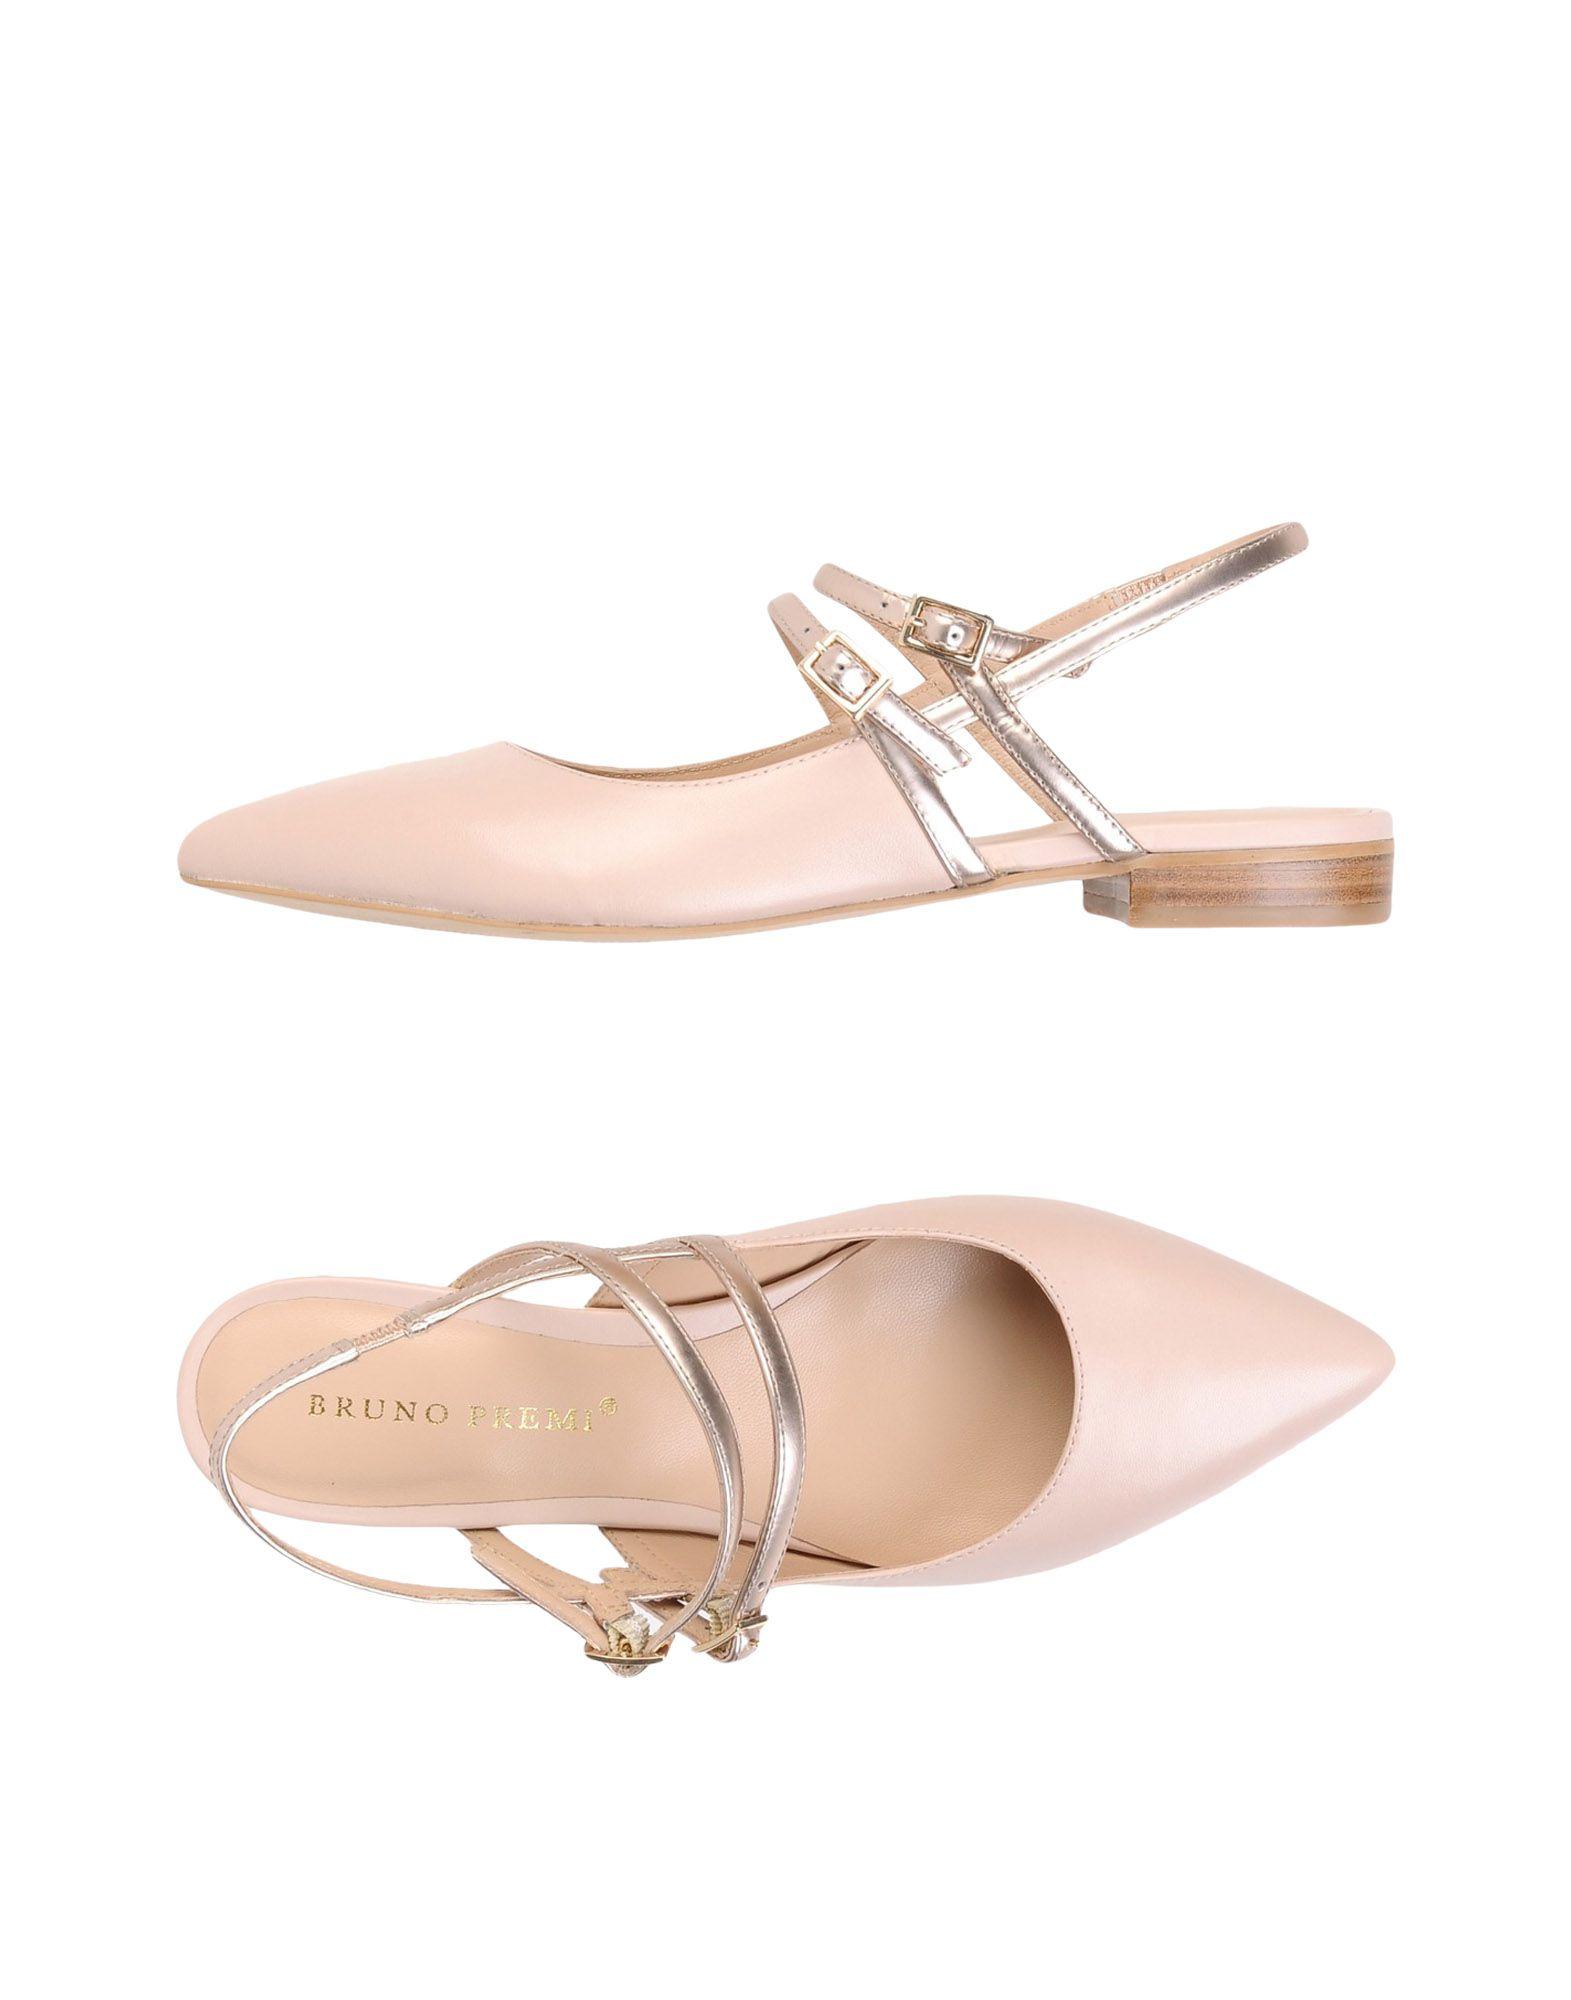 Bruno Premi Ballet Flats - Women Bruno Premi Ballet Australia Flats online on  Australia Ballet - 11463374HB 824b32